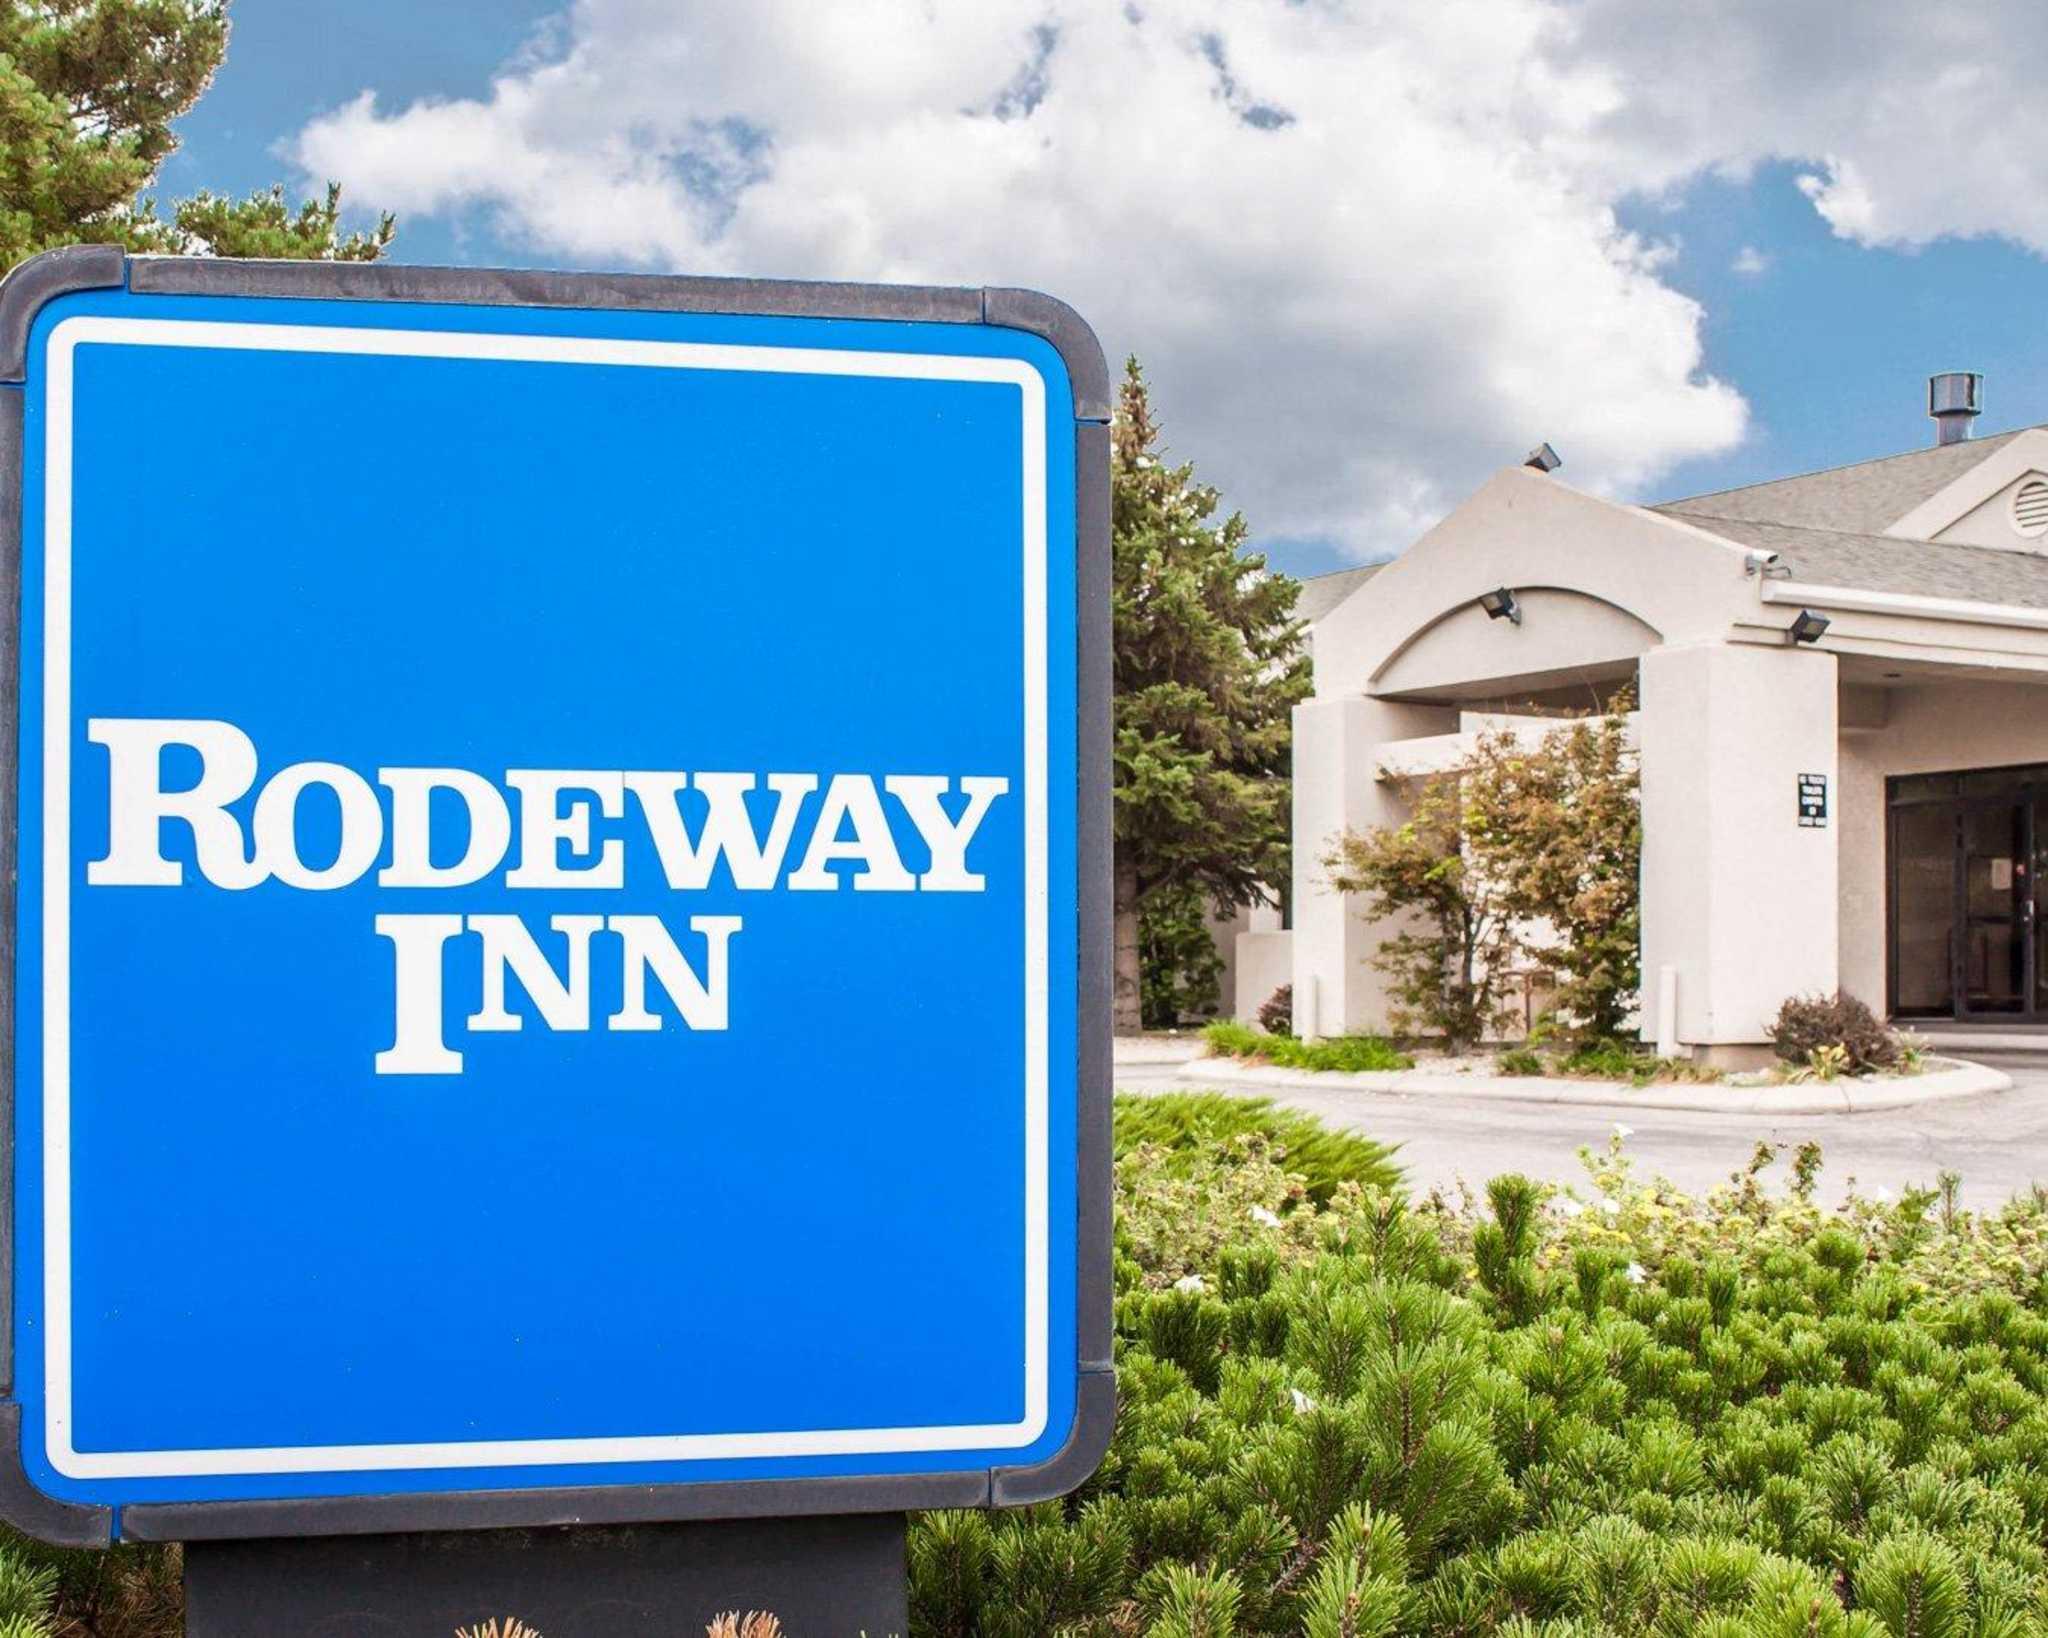 Rodeway Inn Airport image 5